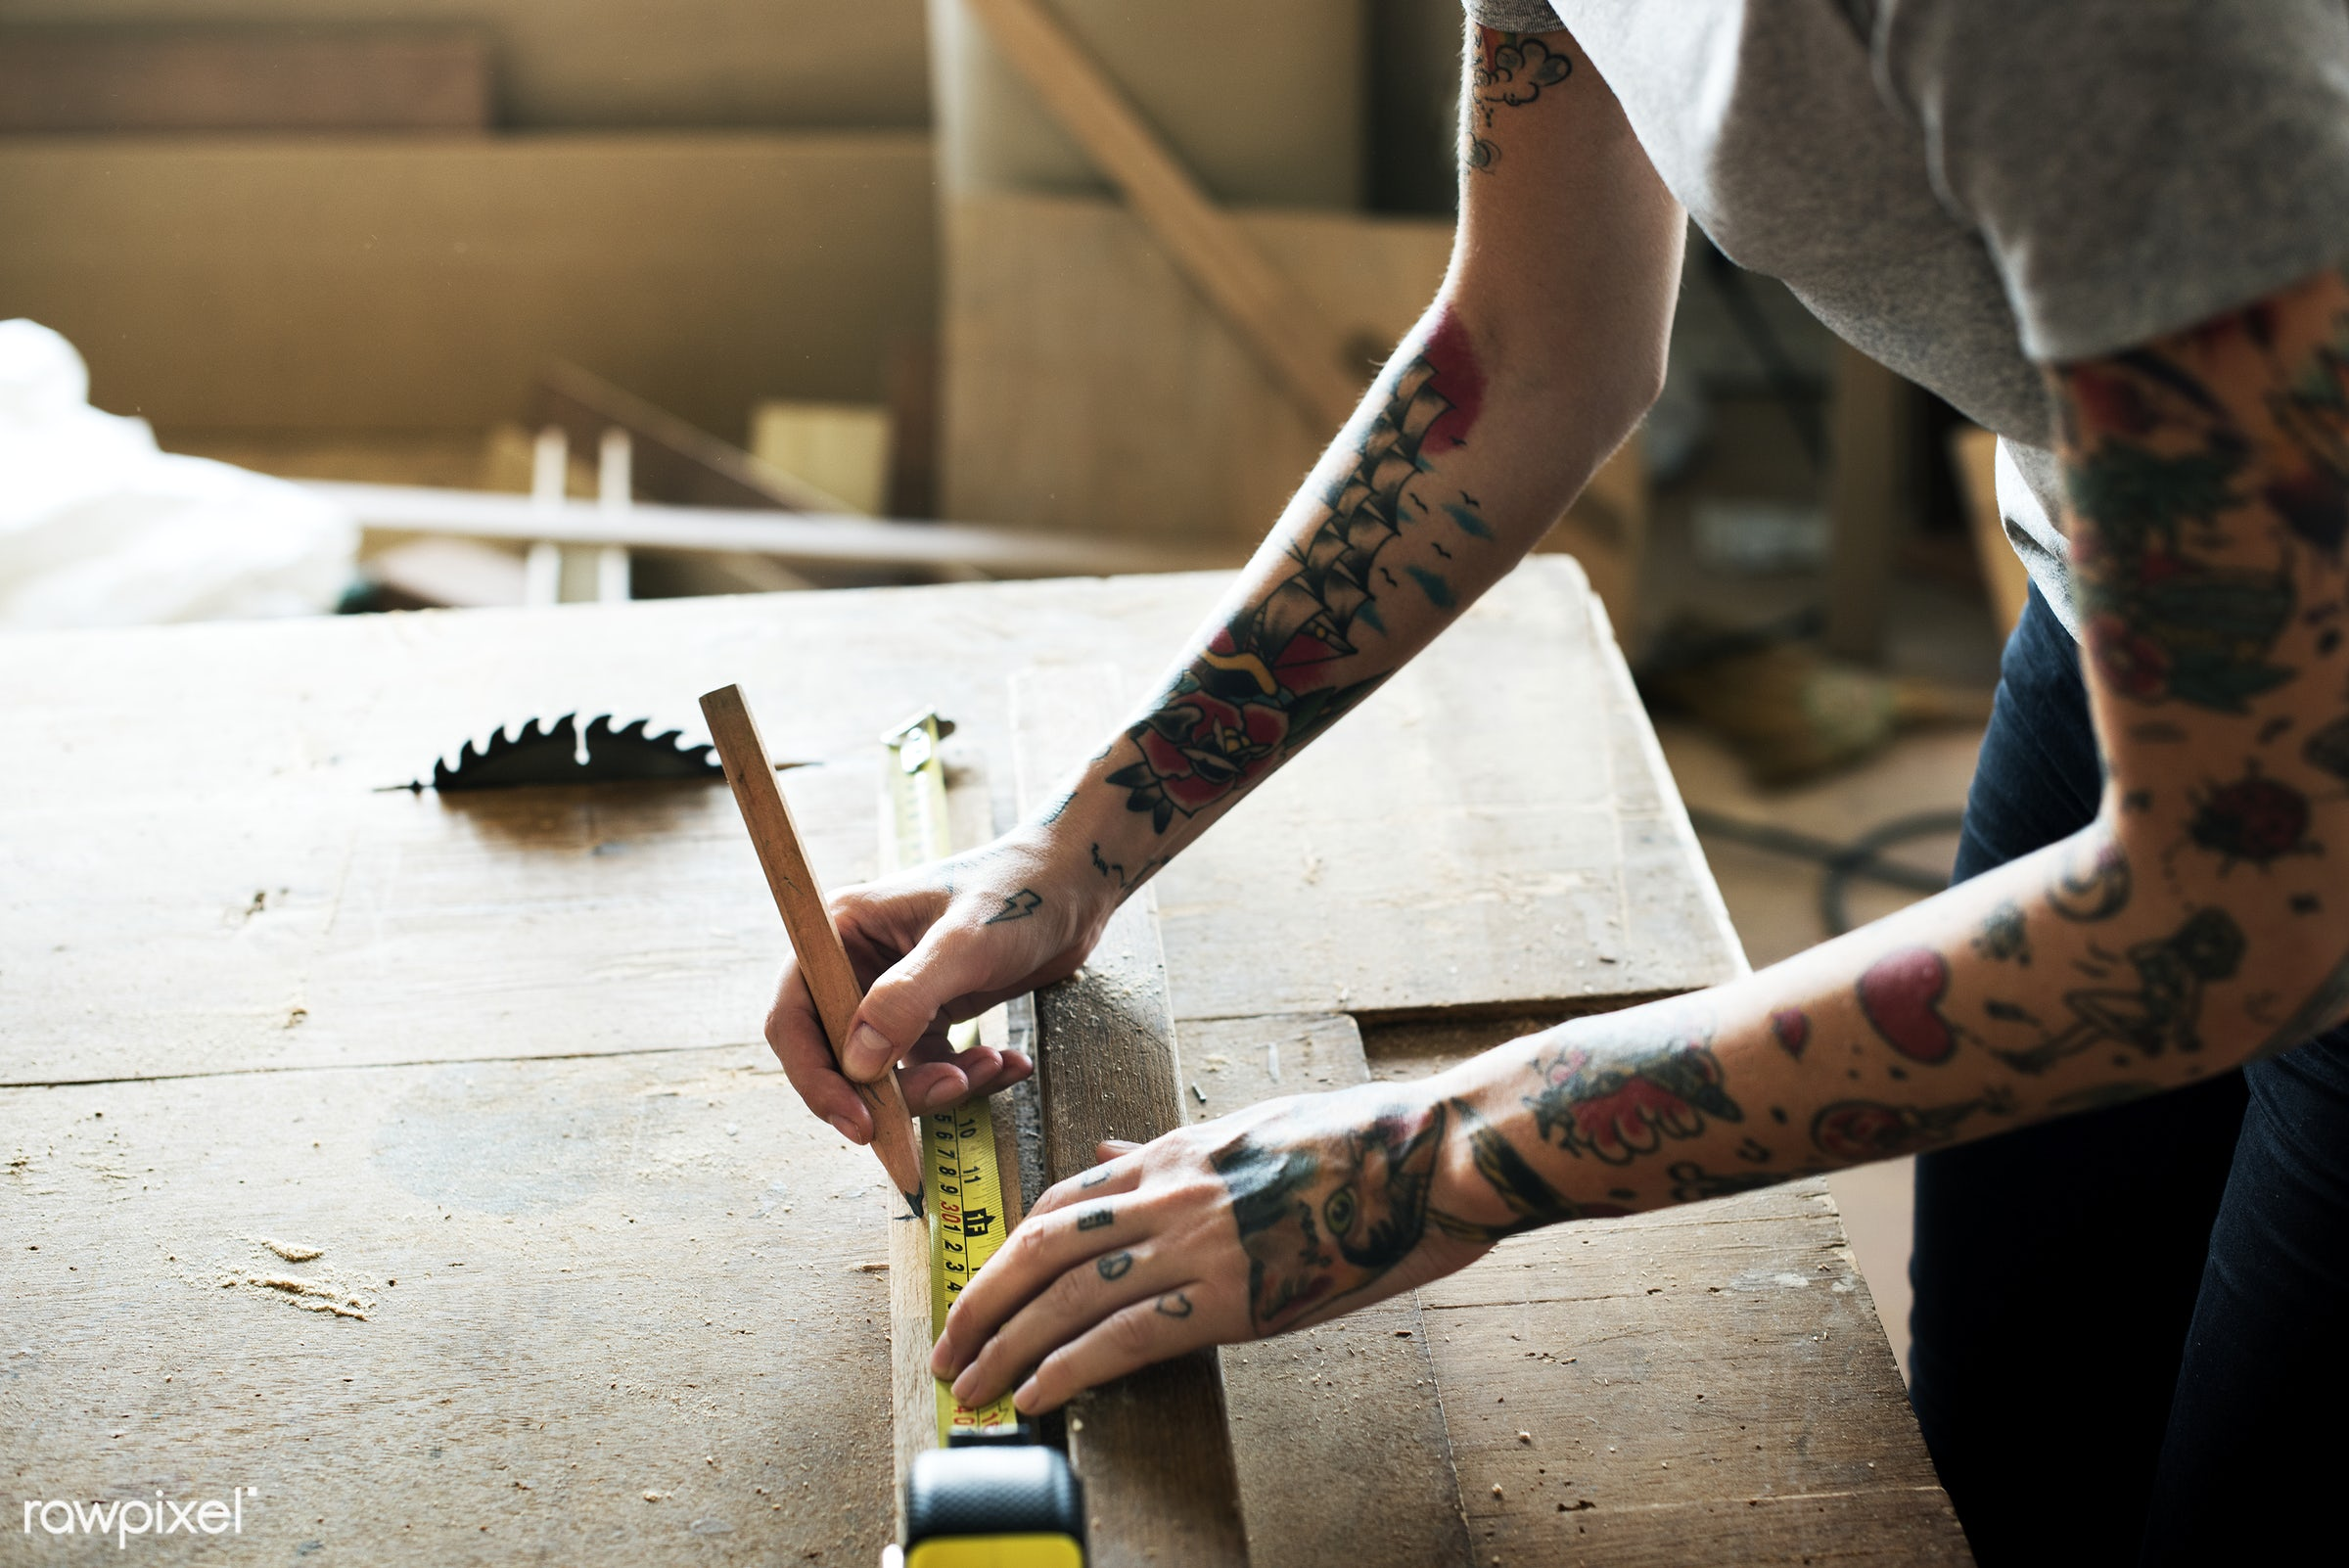 Construction worker - construction, activity, carpenter, carpentry, craft, craftsman, design, diy, equipment, handmade,...